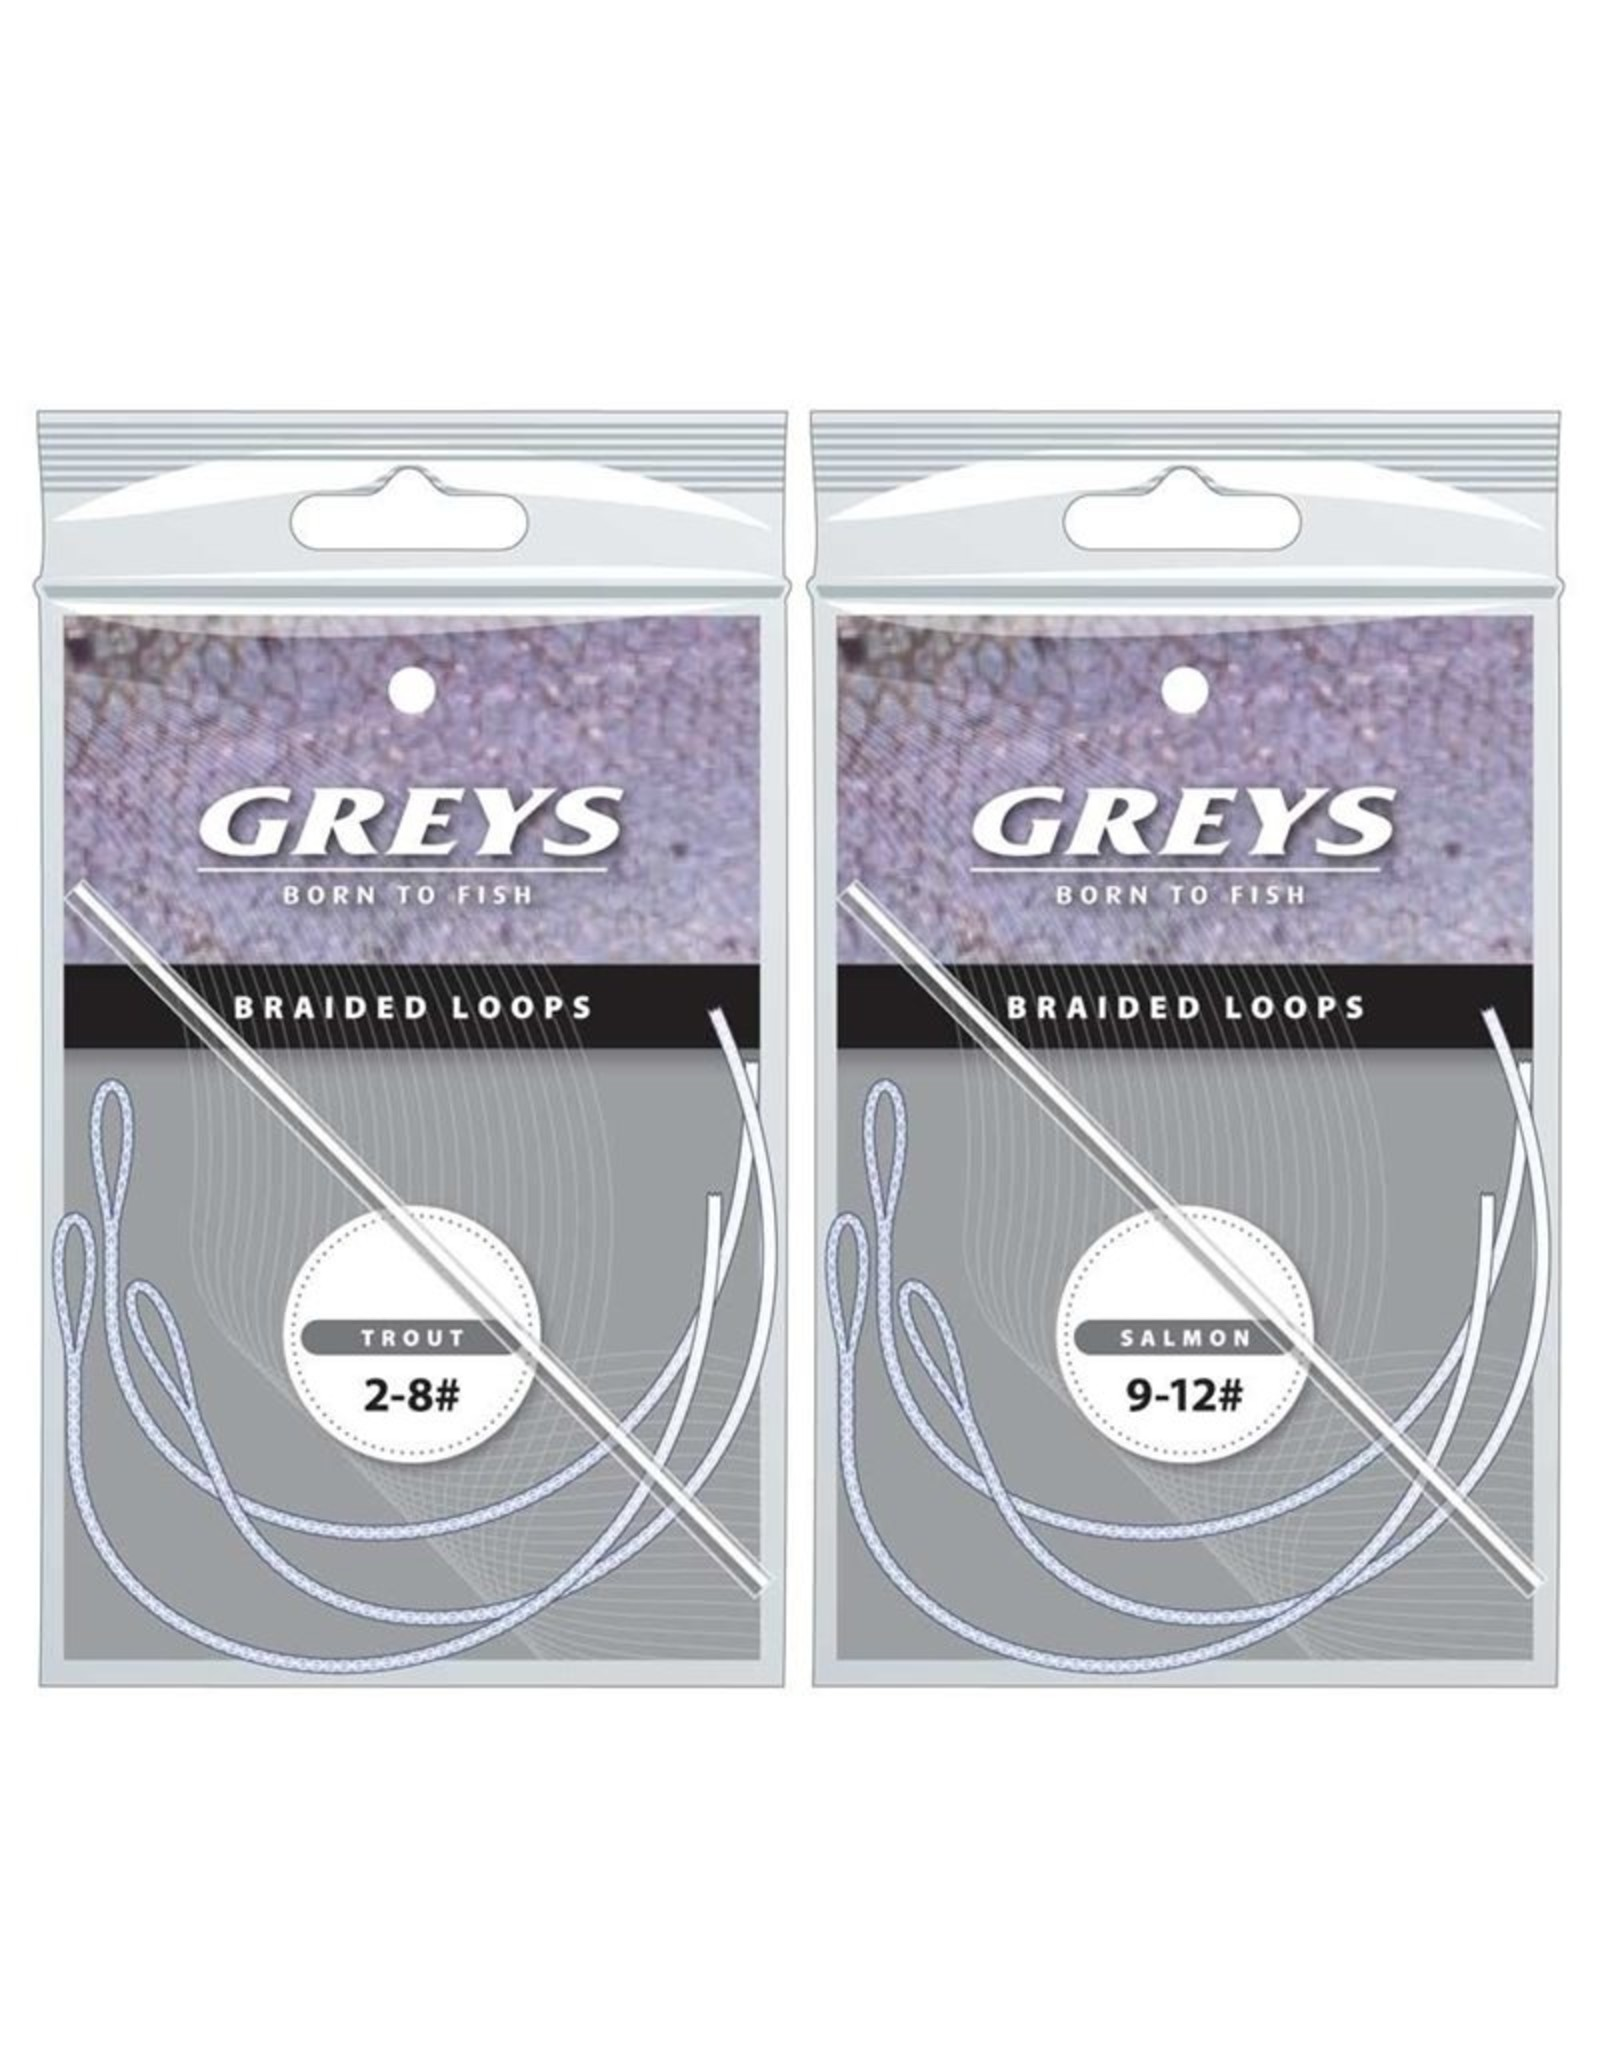 Greys Greys 4 Braided Loops